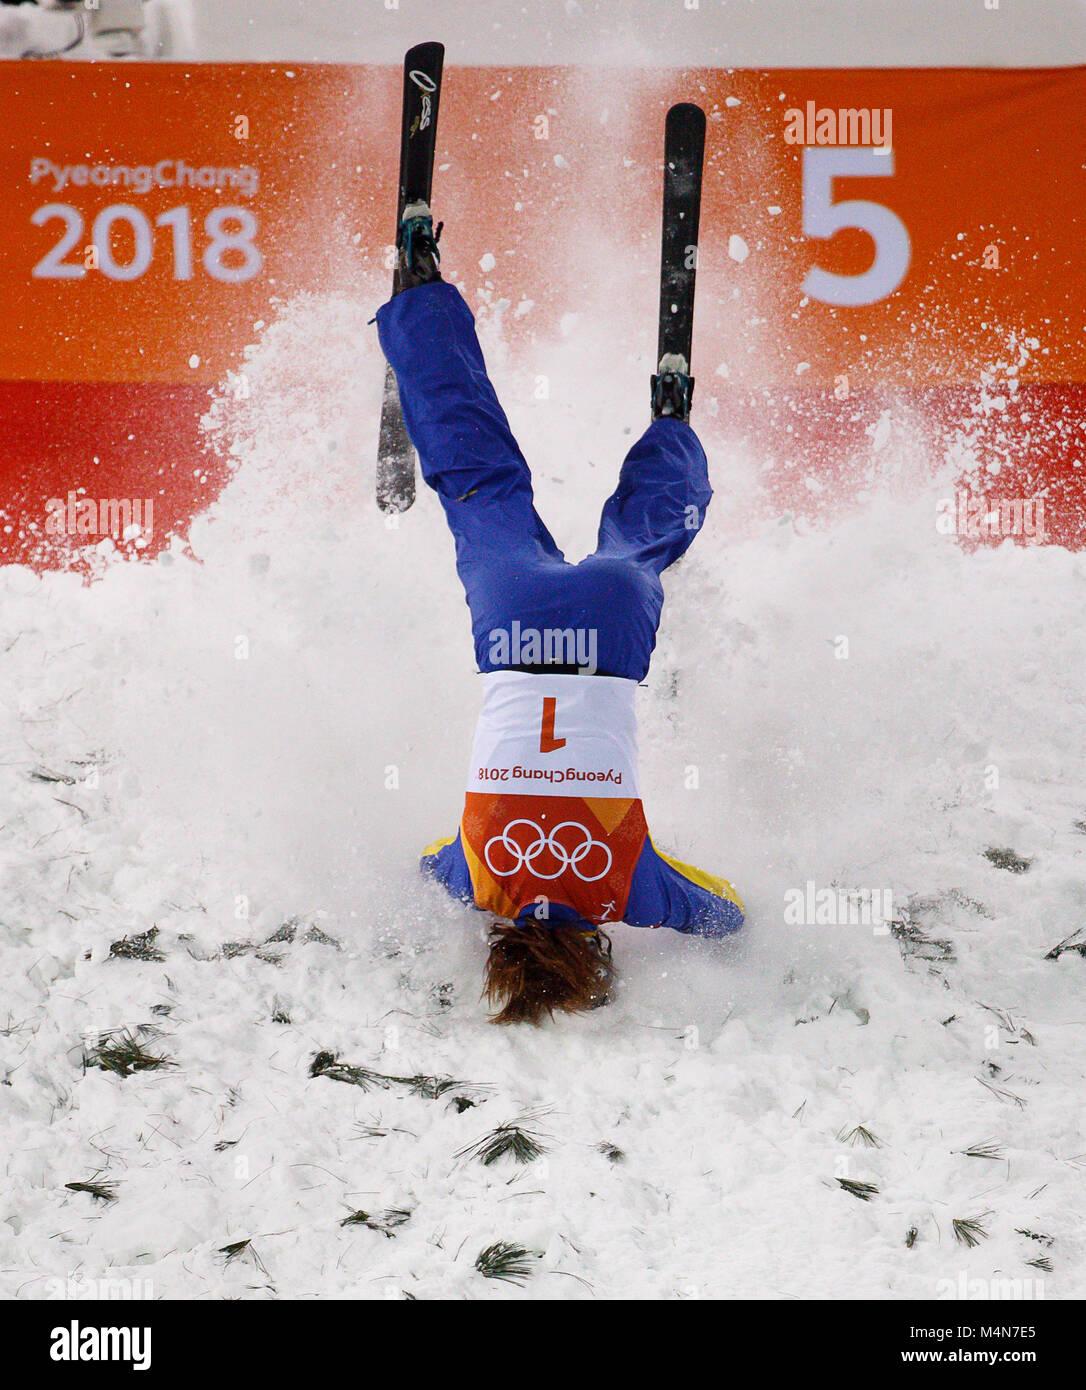 Pyeongchang, South Korea  16th Feb, 2018  Freestyle skier